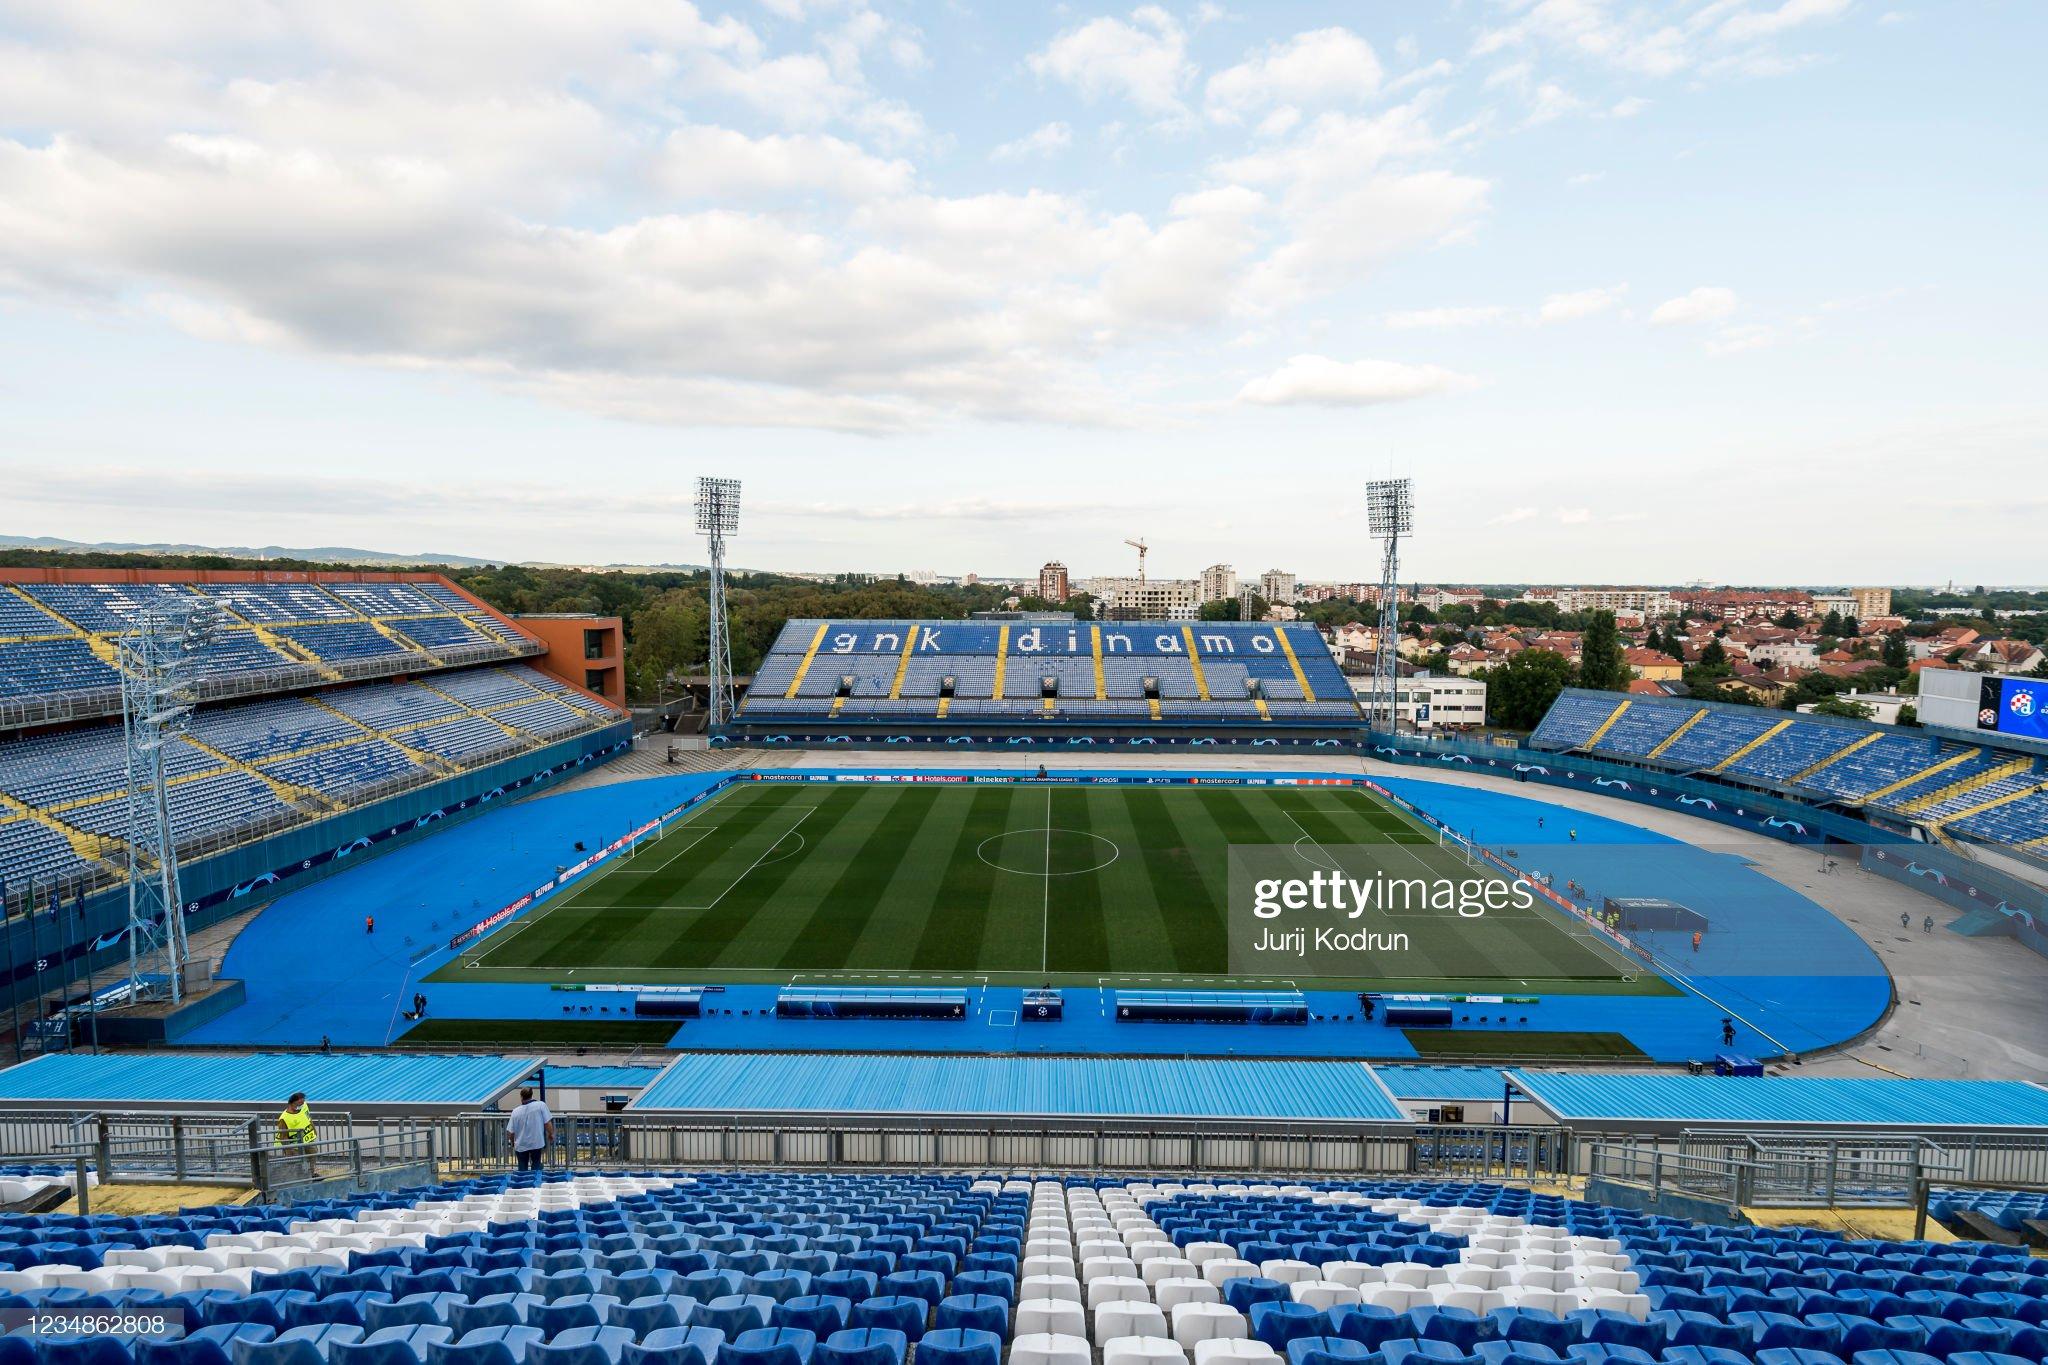 Dinamo Zagreb vs West Ham Preview, prediction and odds